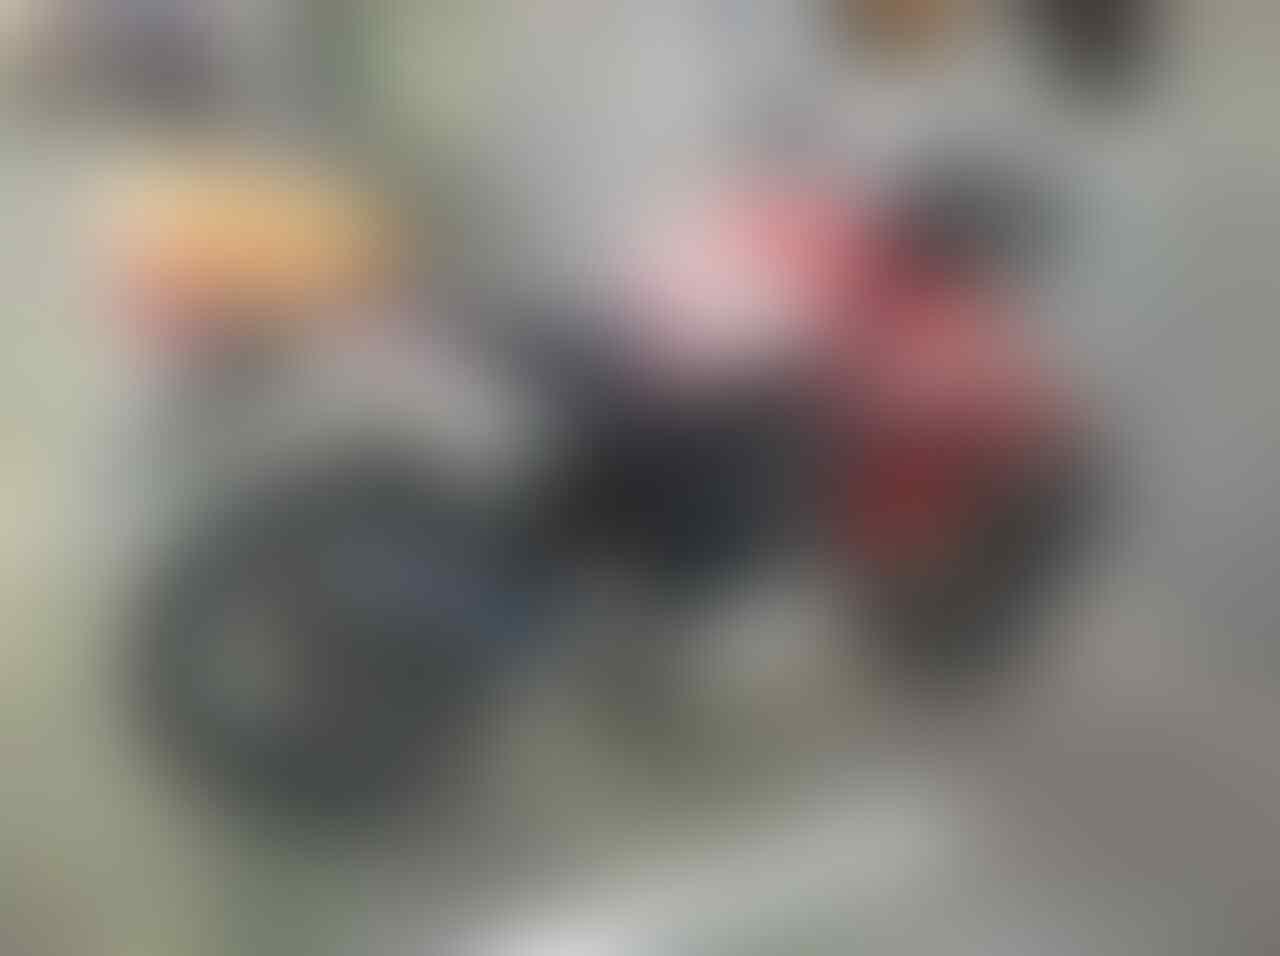 [HOSTICUS] Honda CB150R Streetfire Community on Kaskus - Part 1